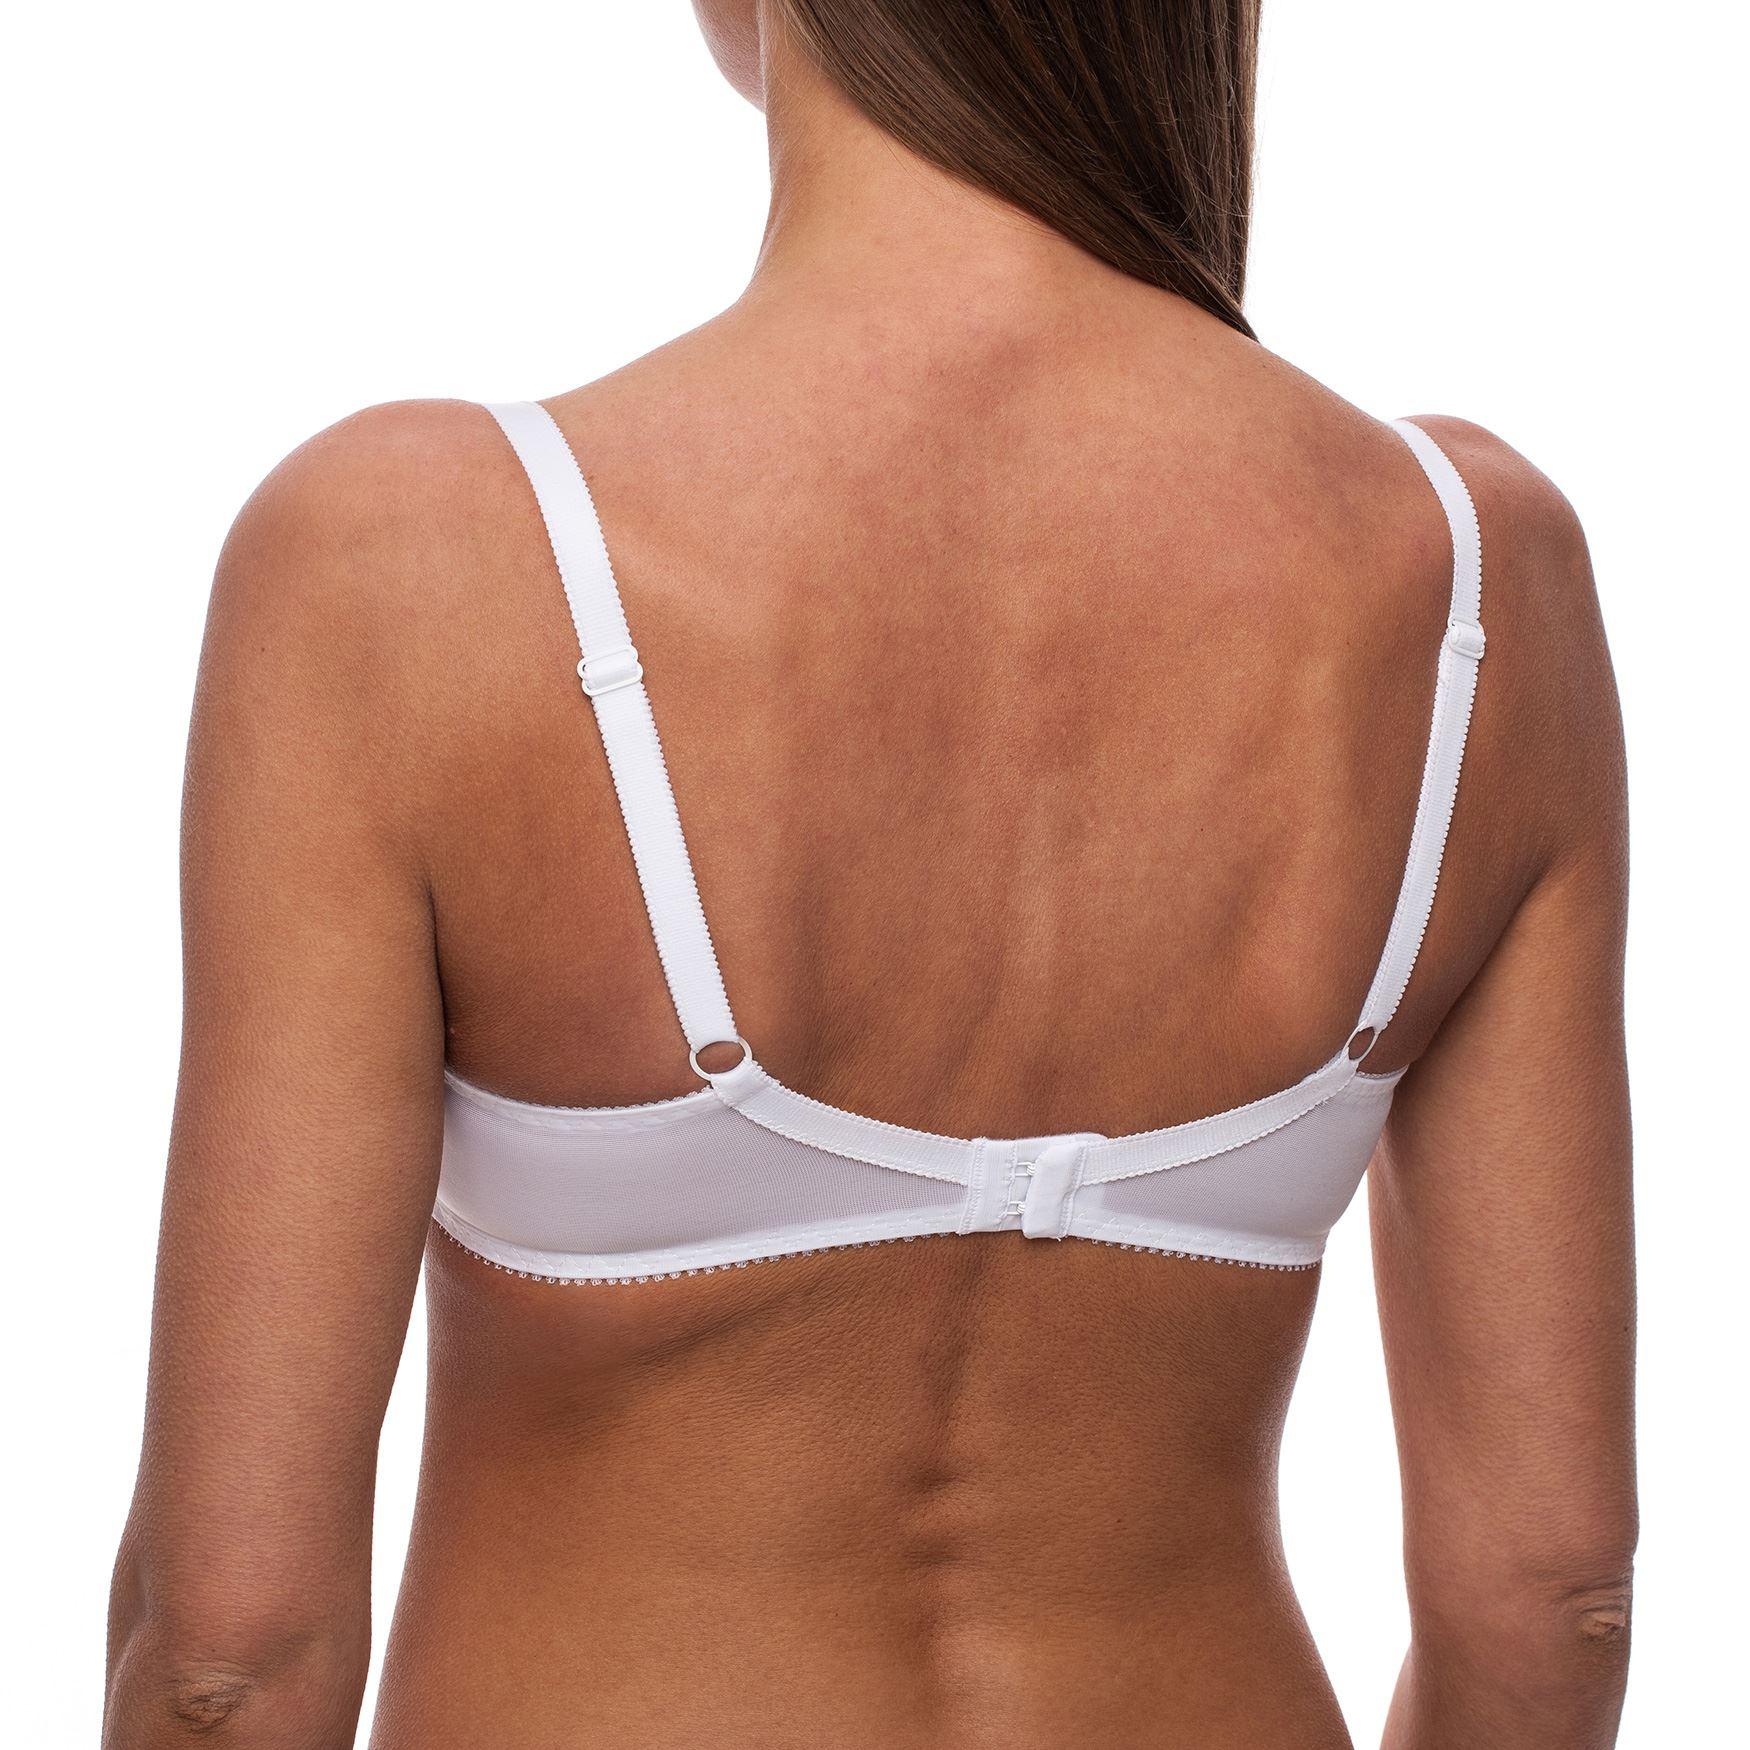 Minimizer-Bra-Sheer-Lace-Unlined-Plus-Size-Comfort-Full-Coverage-Sleep-Figure thumbnail 23